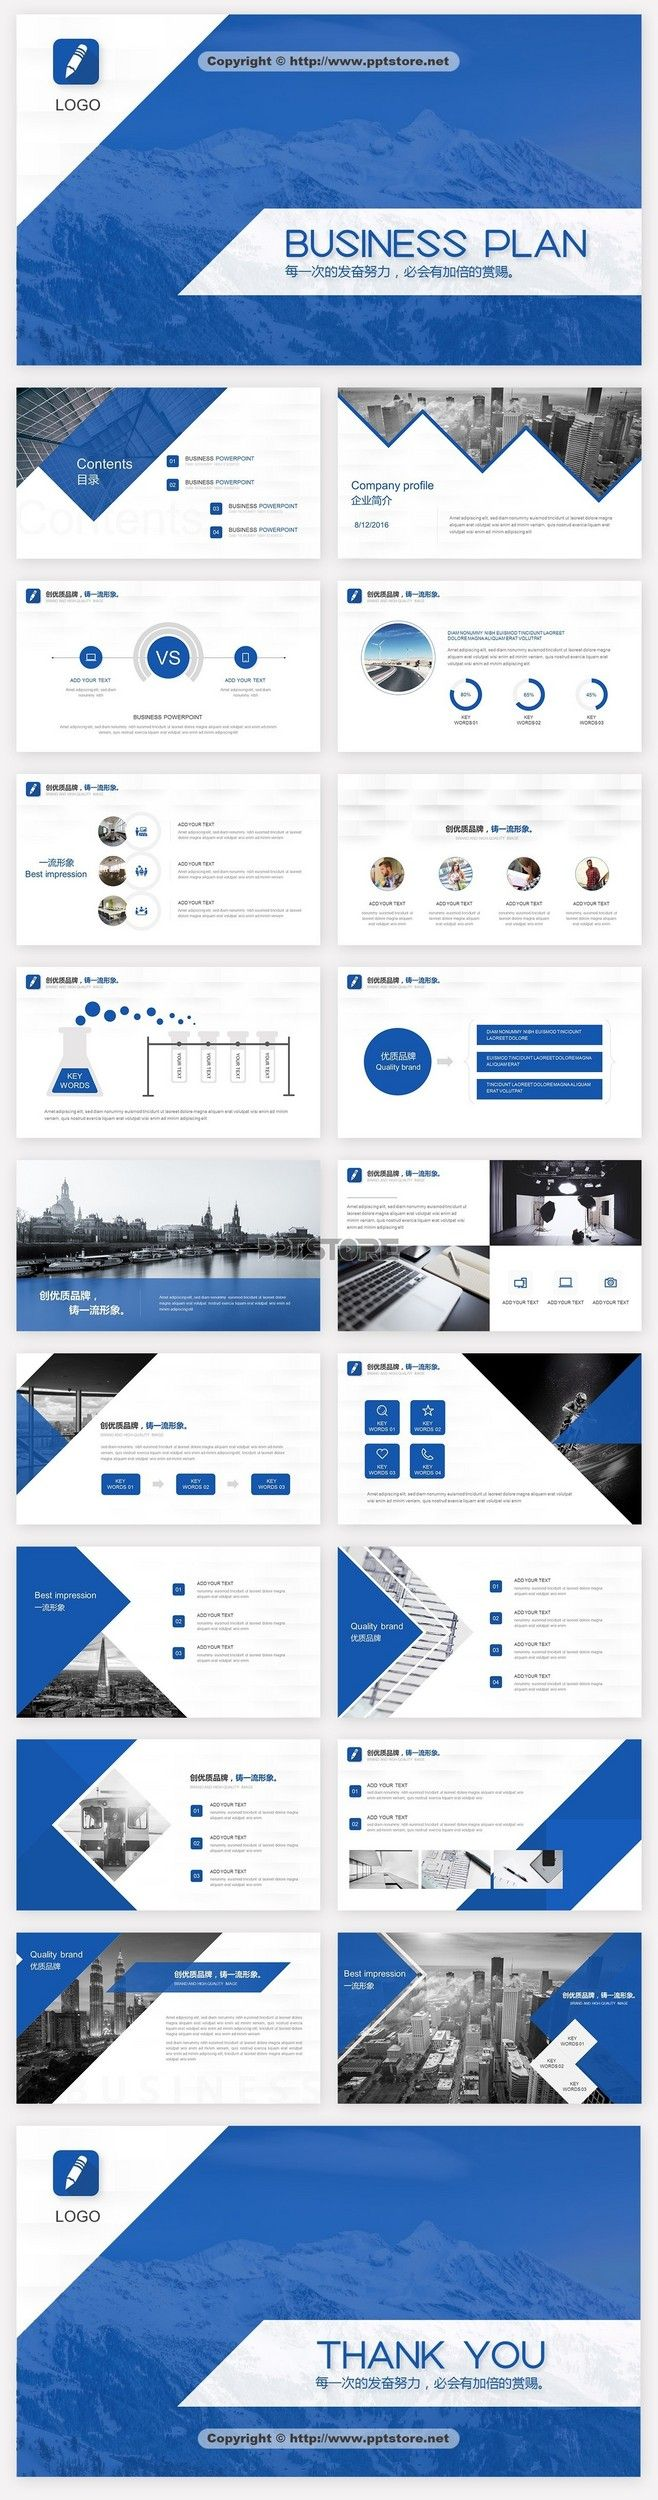 【BLUE】蓝色(二十五)工作报告模板【...